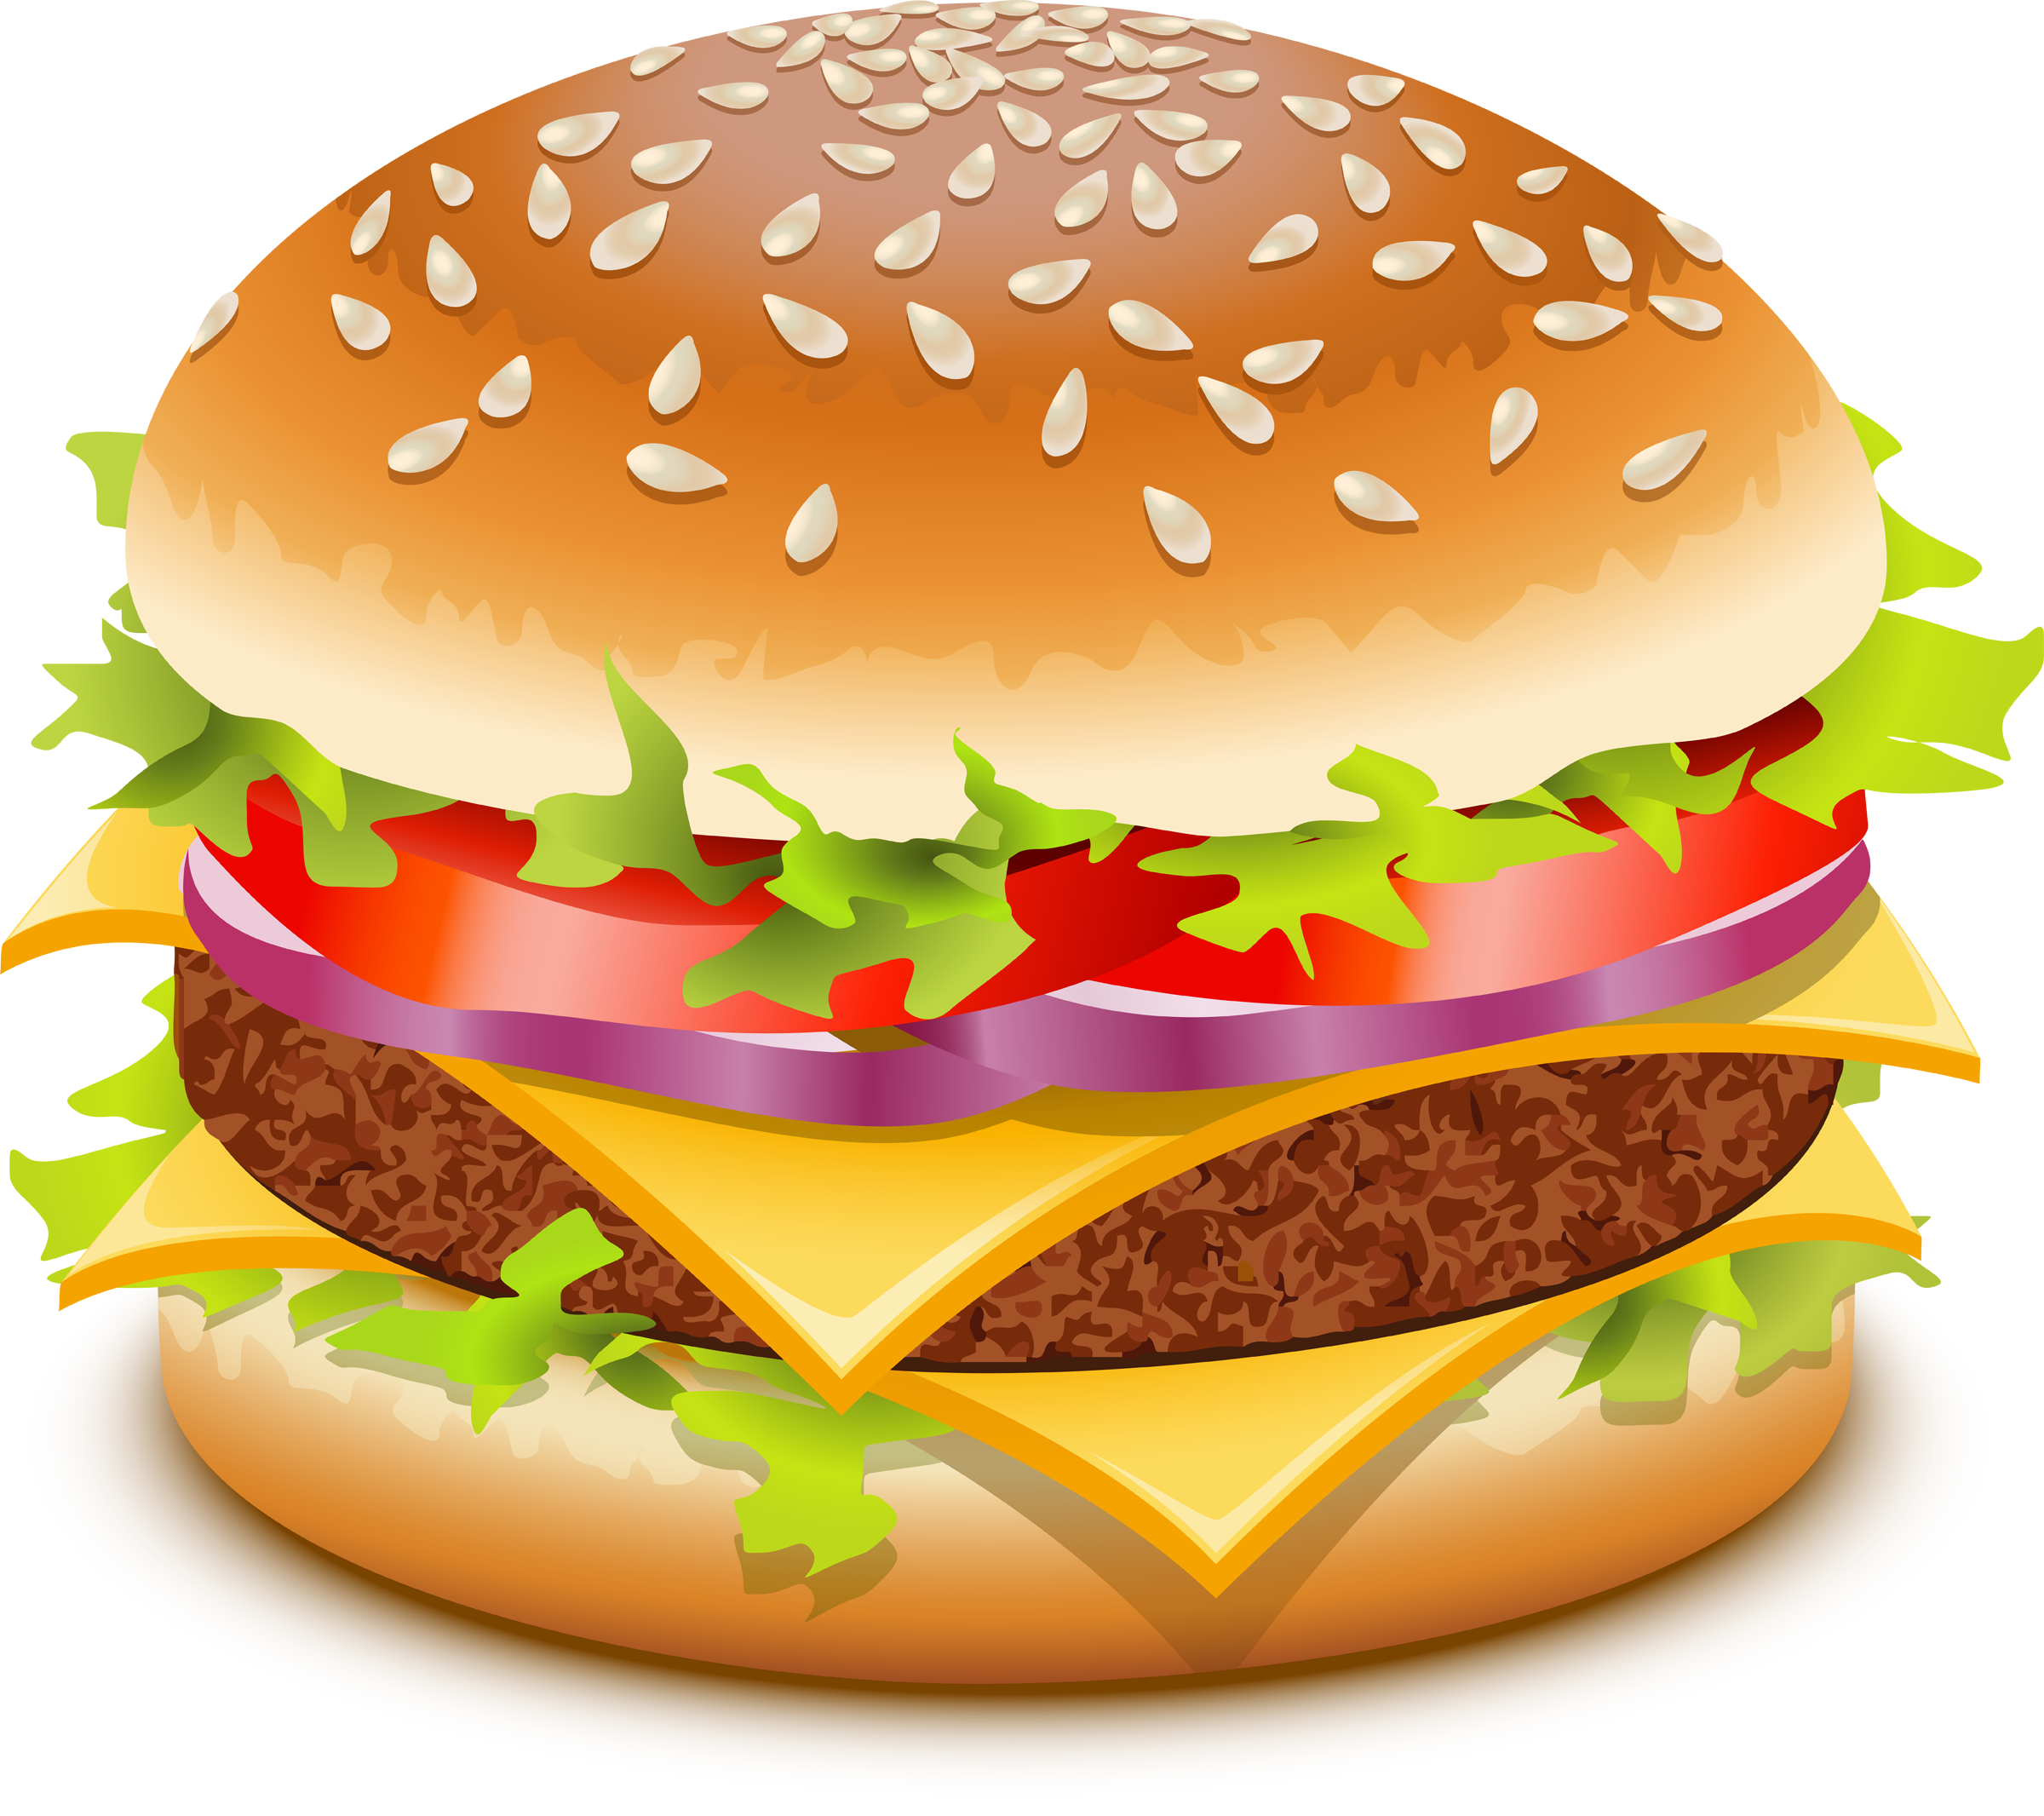 Burger Clipart Png Good Galleries-Burger Clipart Png Good Galleries-1